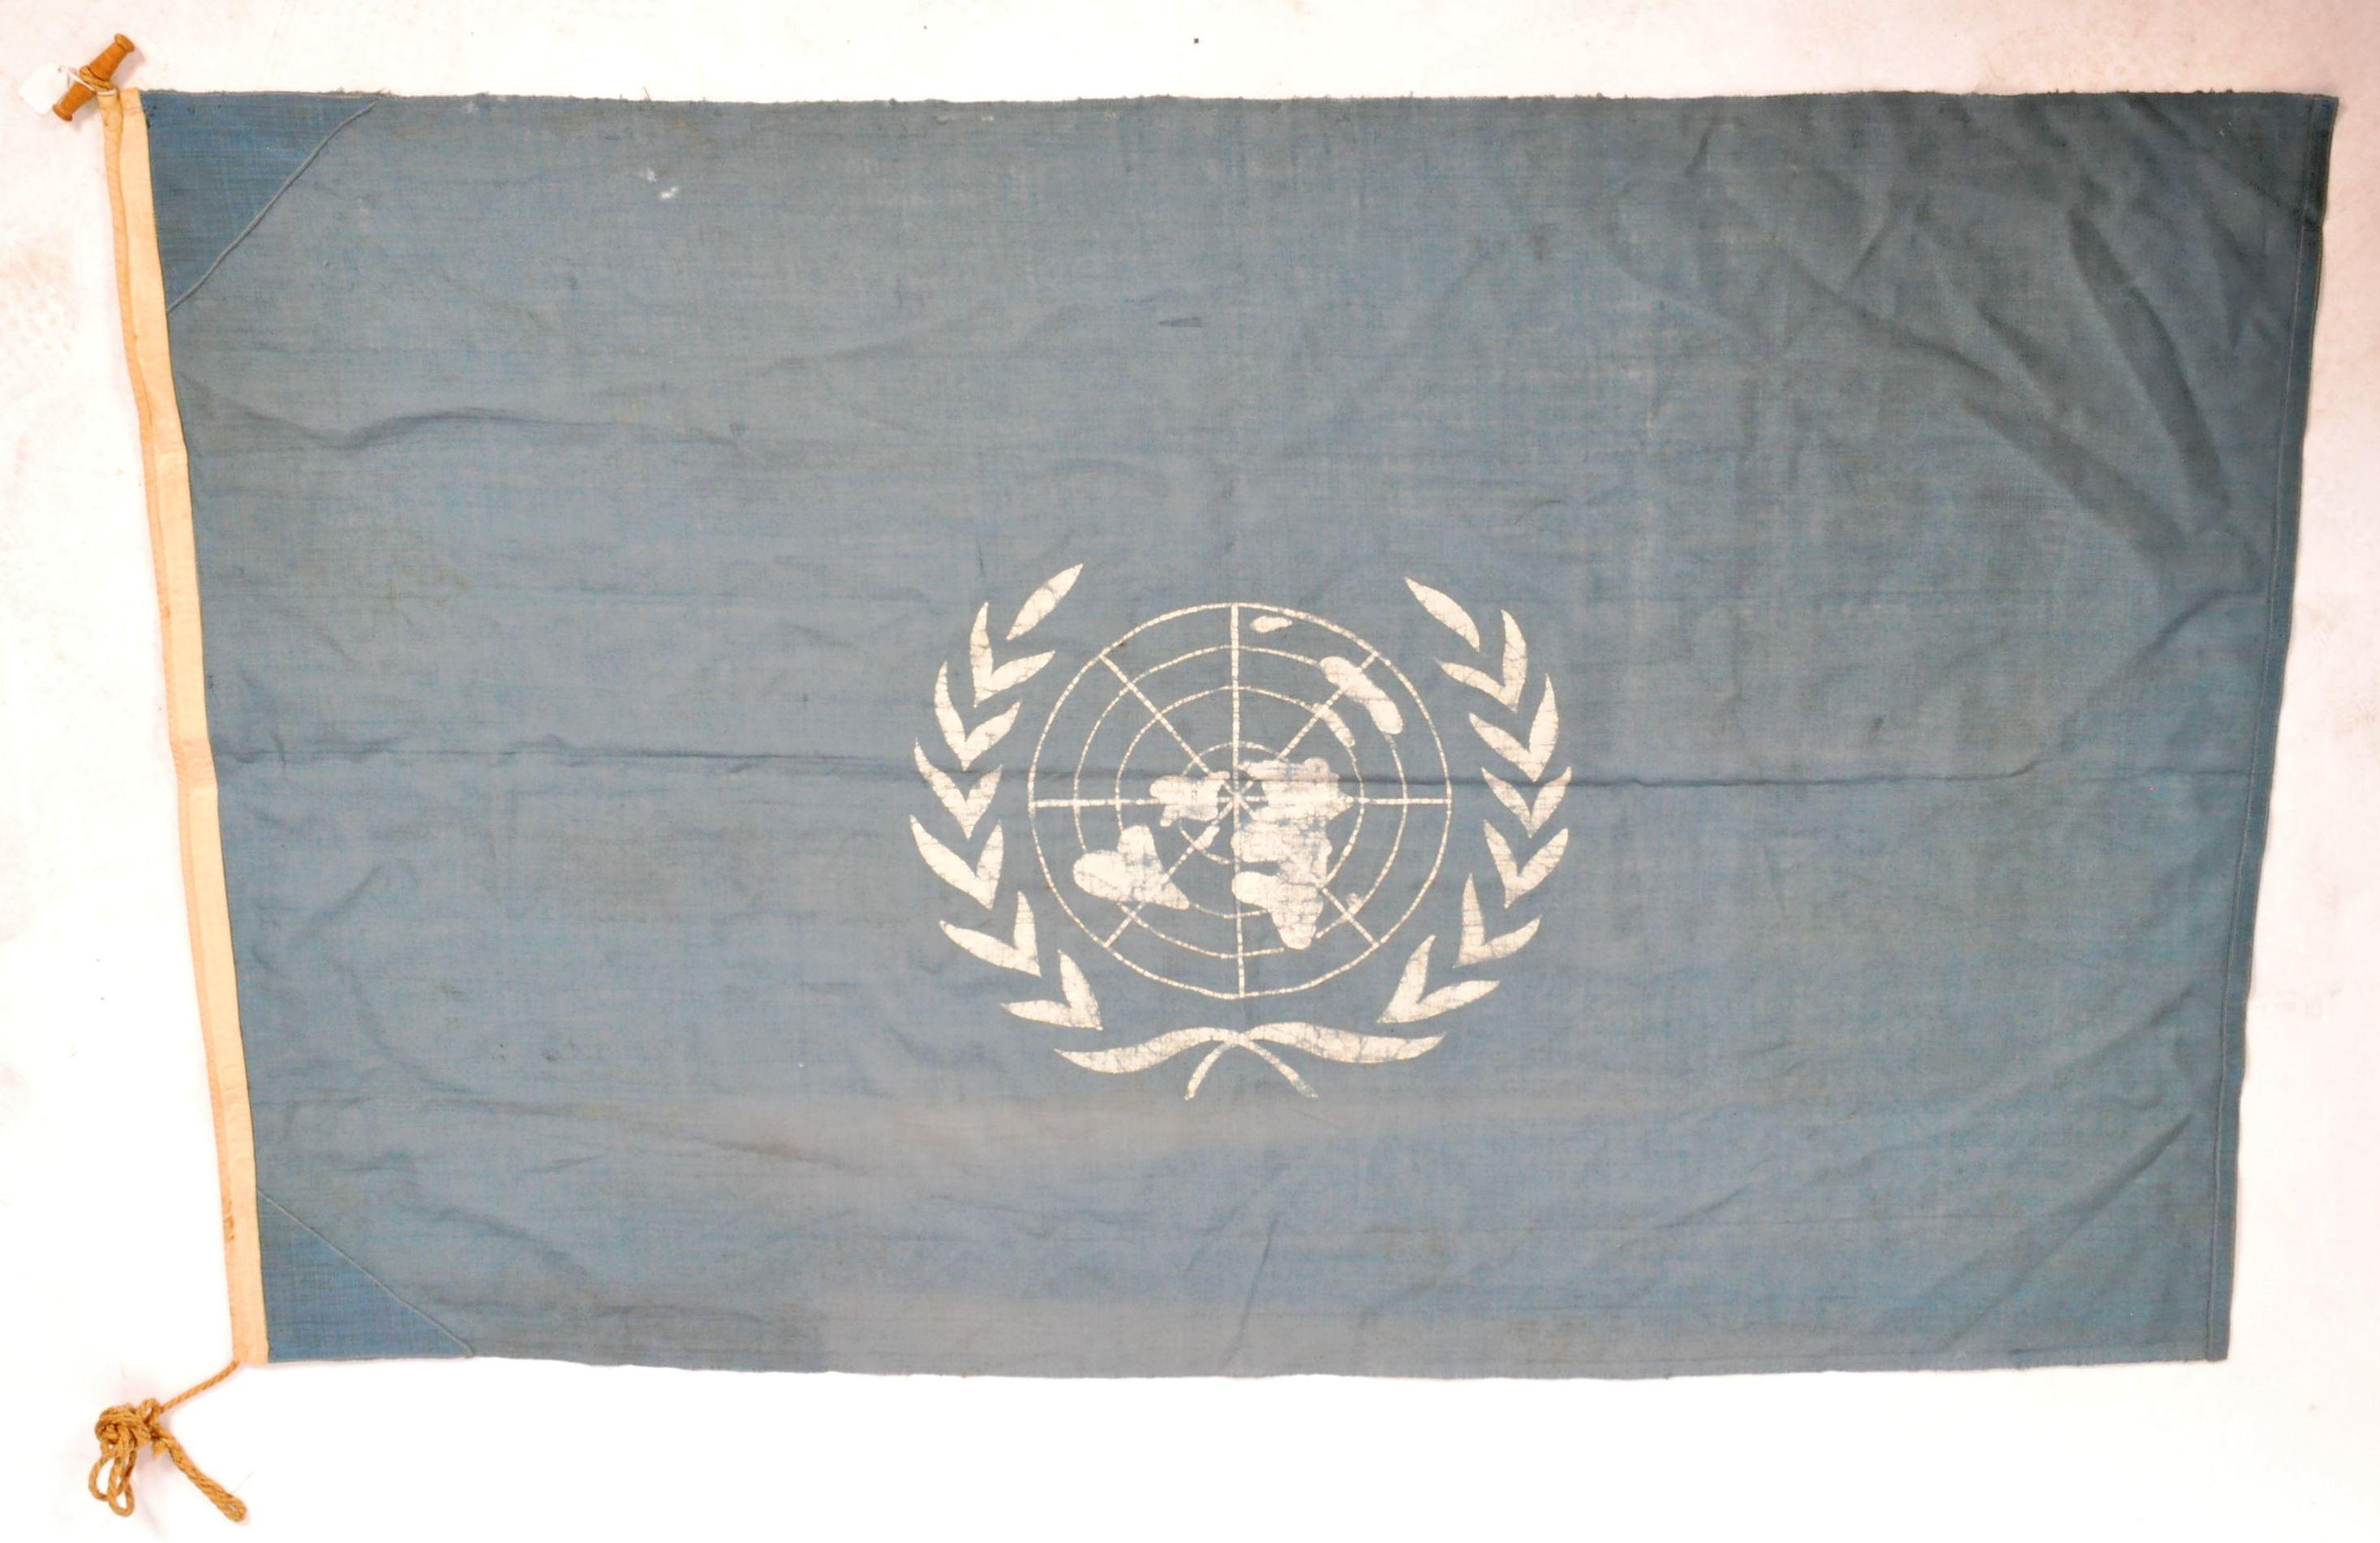 VINTAGE C1950S KOREAN WAR ERA UN UNITED NATIONS FLAG - Image 6 of 6